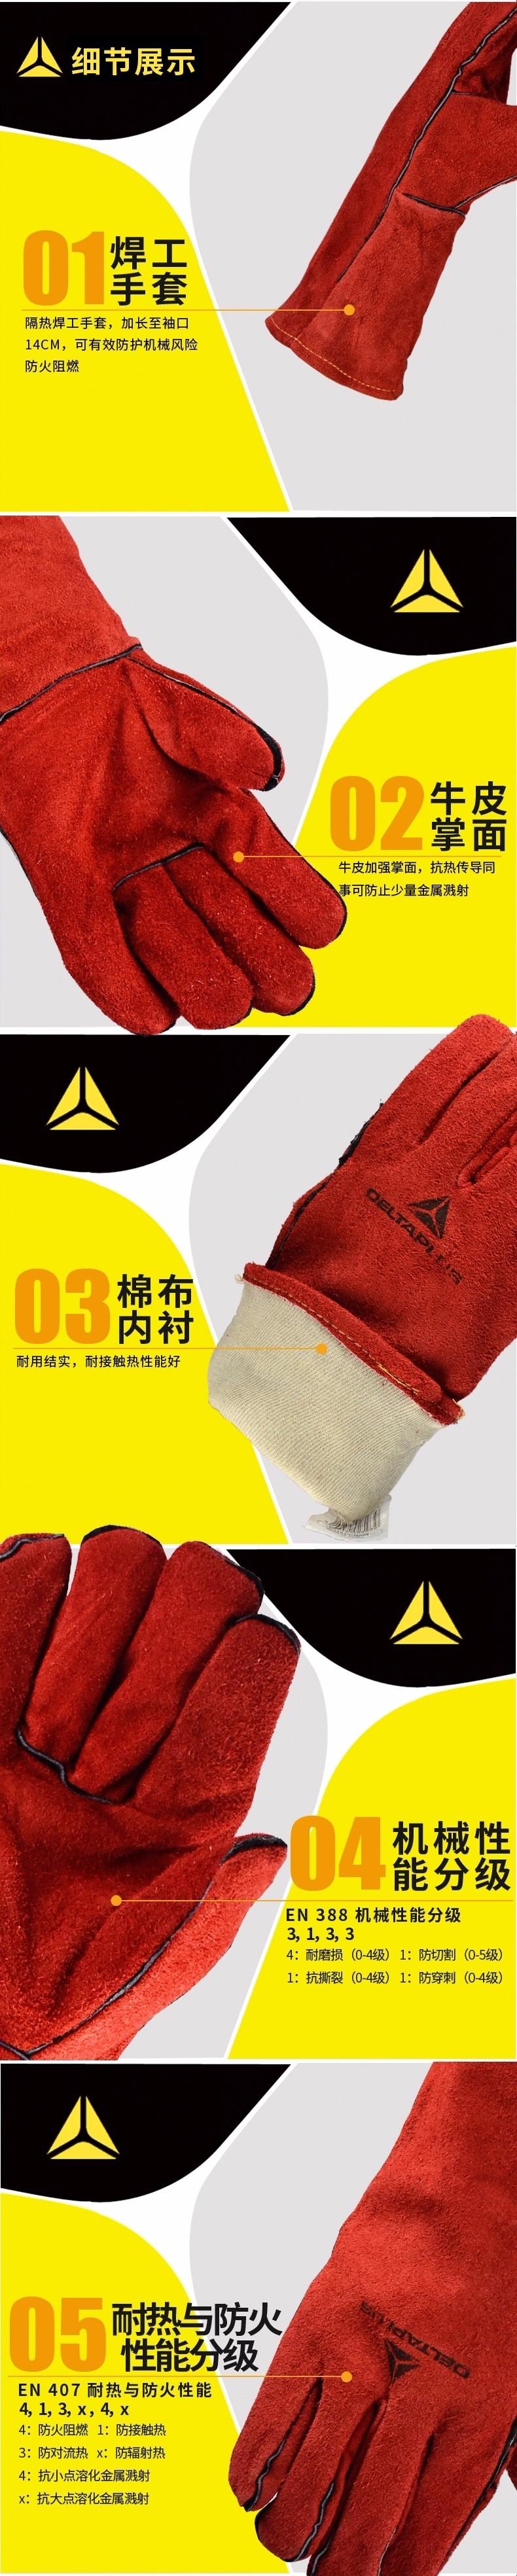 Deltaplus welding gloves welder\'s cowhide high temperature resistance wear-resistant long design wear-resistant work gloves (5)